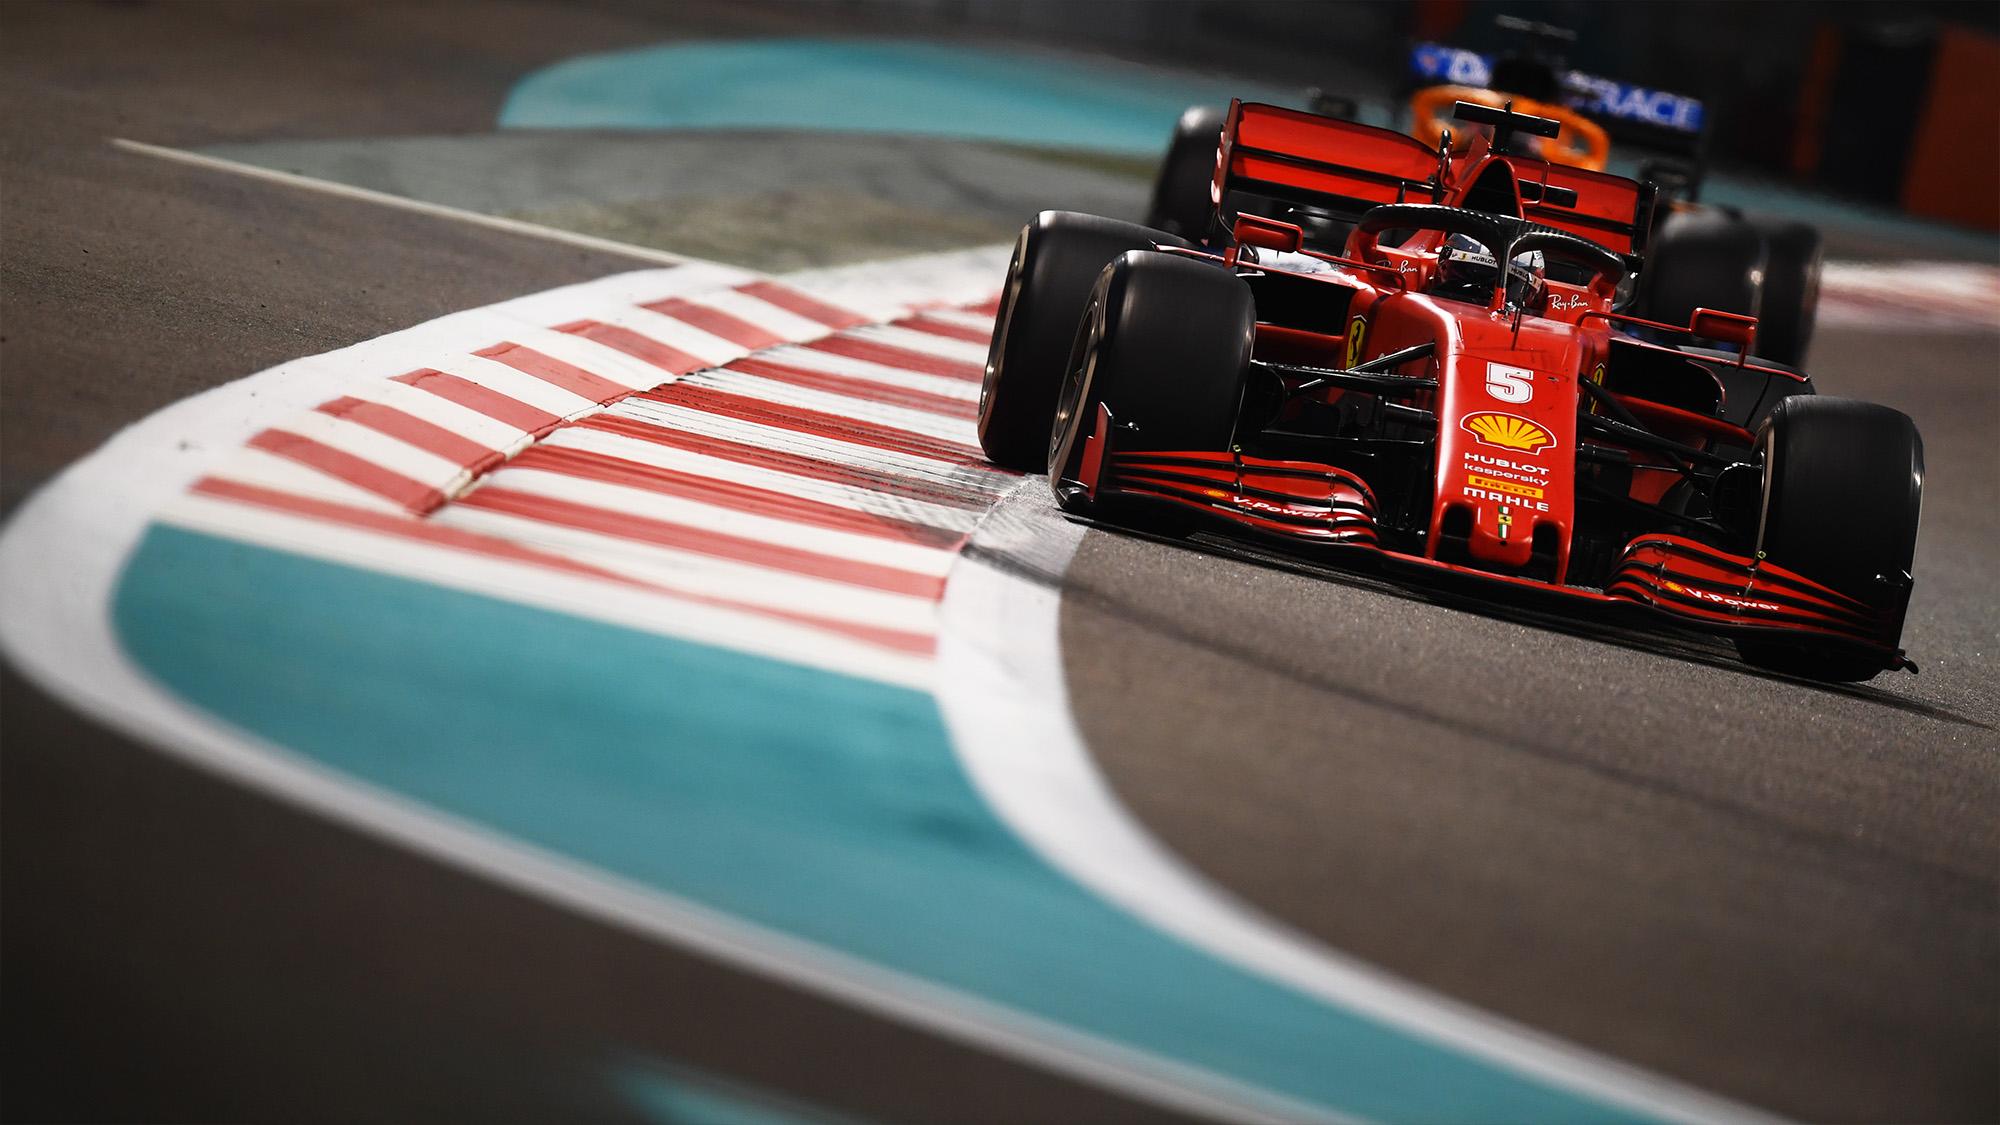 Sebastian Vettel during the 2020 Abu Dhabi Grand Prix